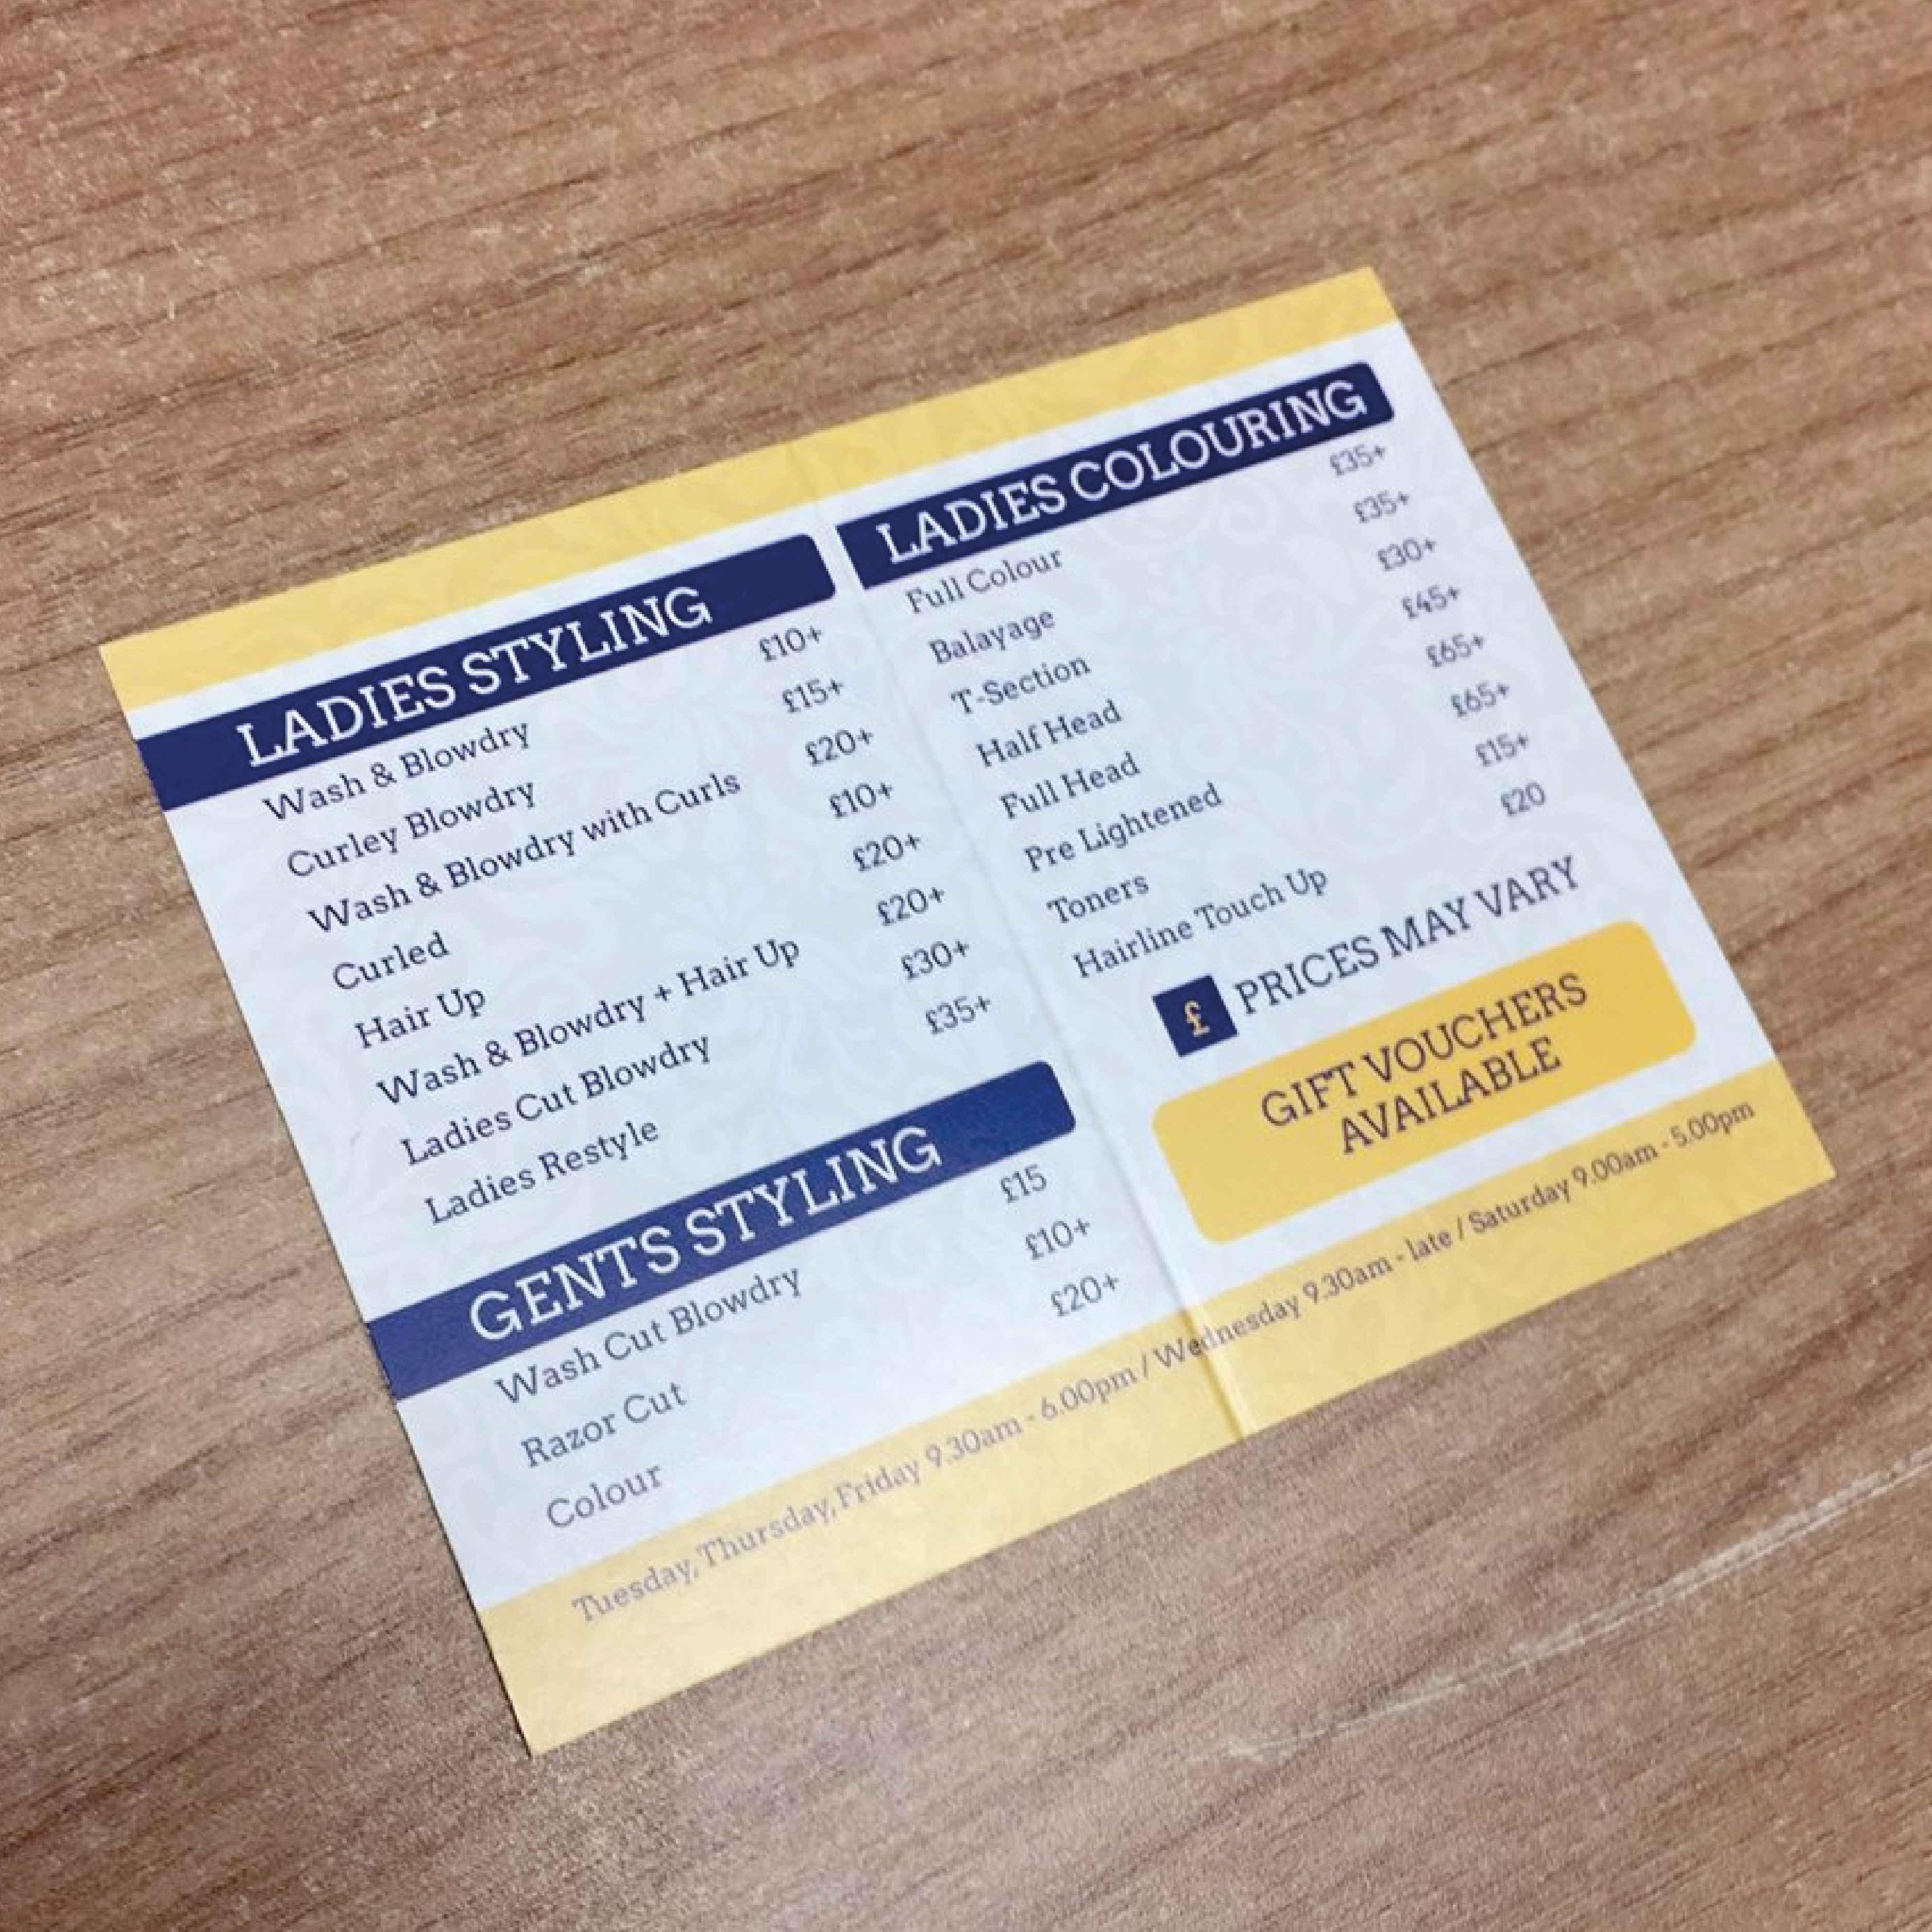 Business cards 29 web design graphic design logo design derry business cards 29 colourmoves